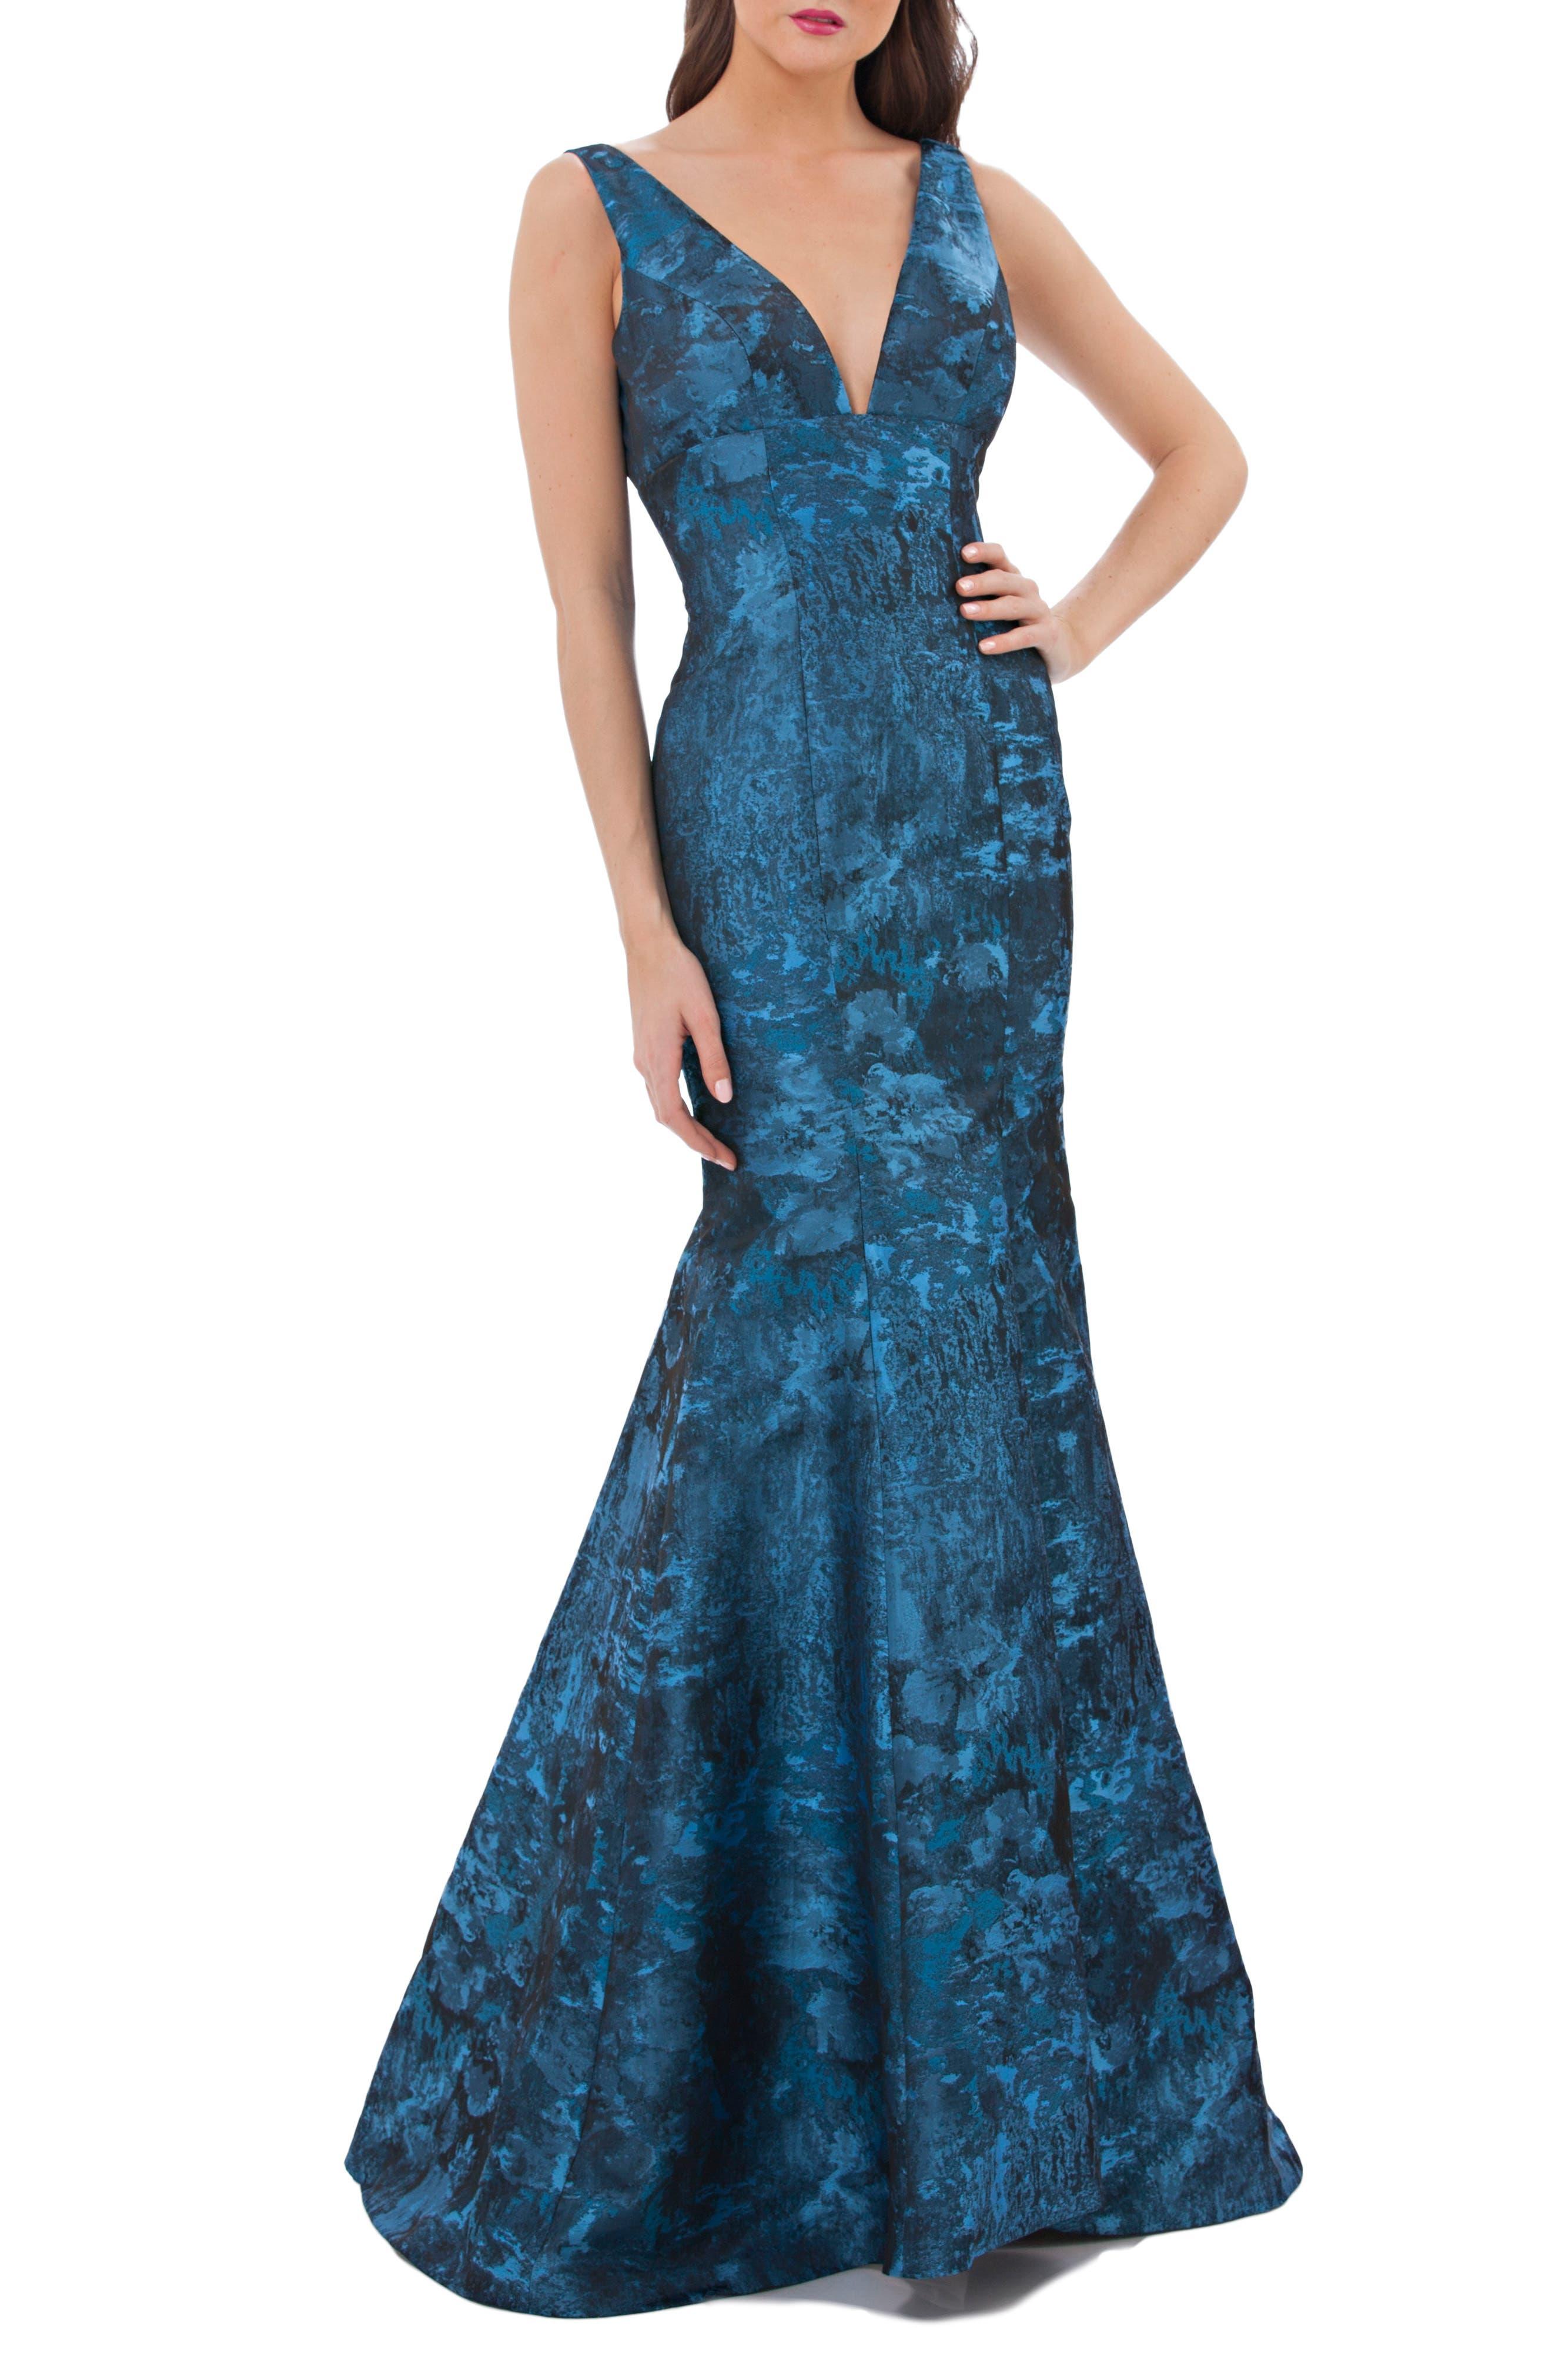 Main Image - Carmen Marc Valvo Infusion Plunging Brocade Mermaid Dress